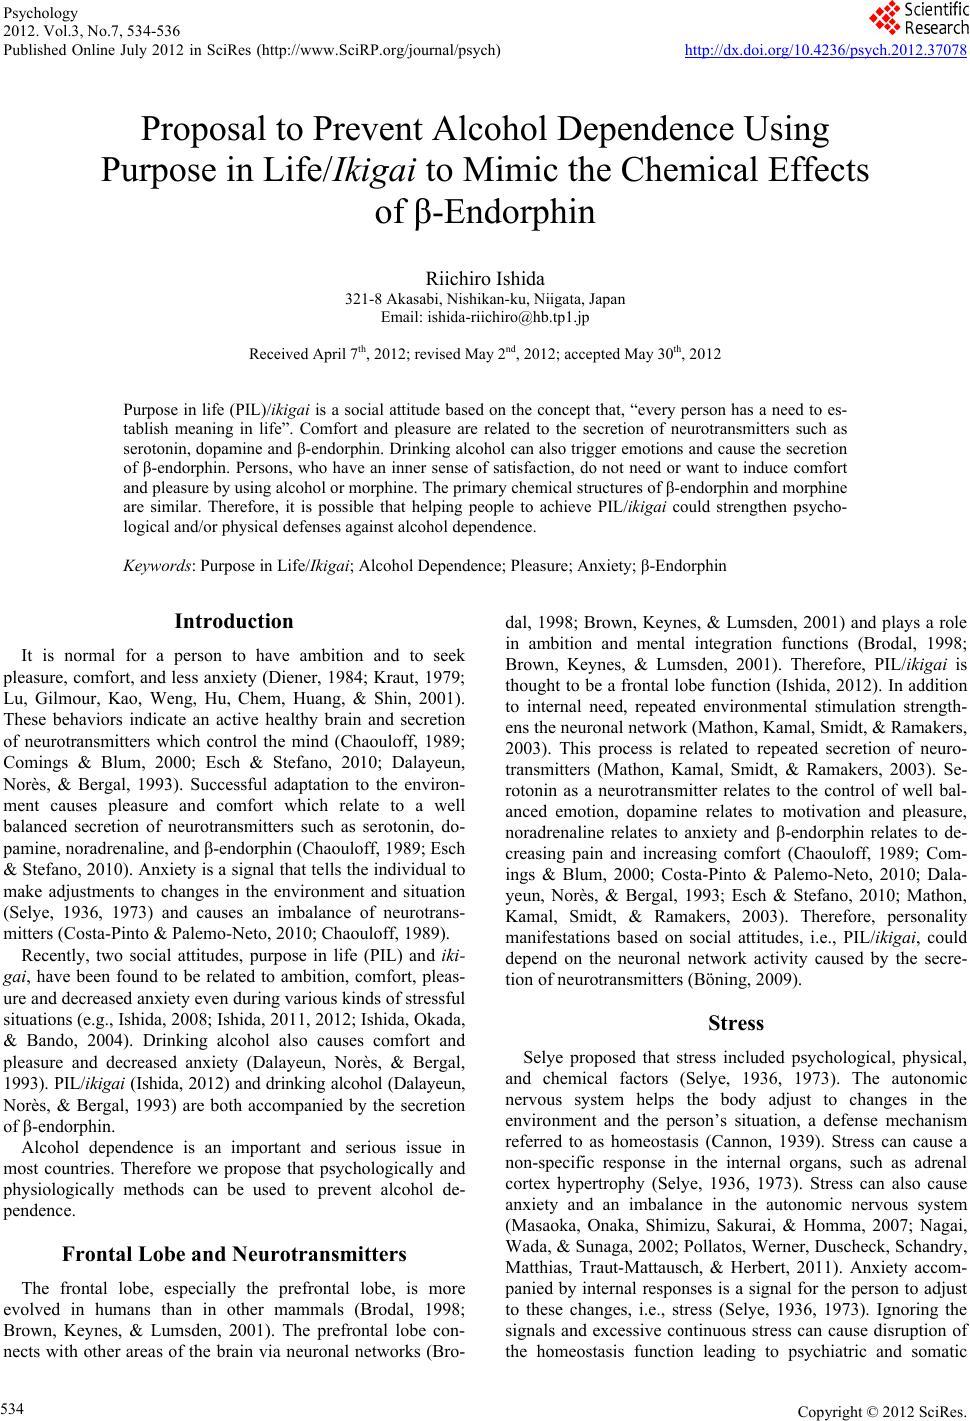 Essays on reducing carbon footprint